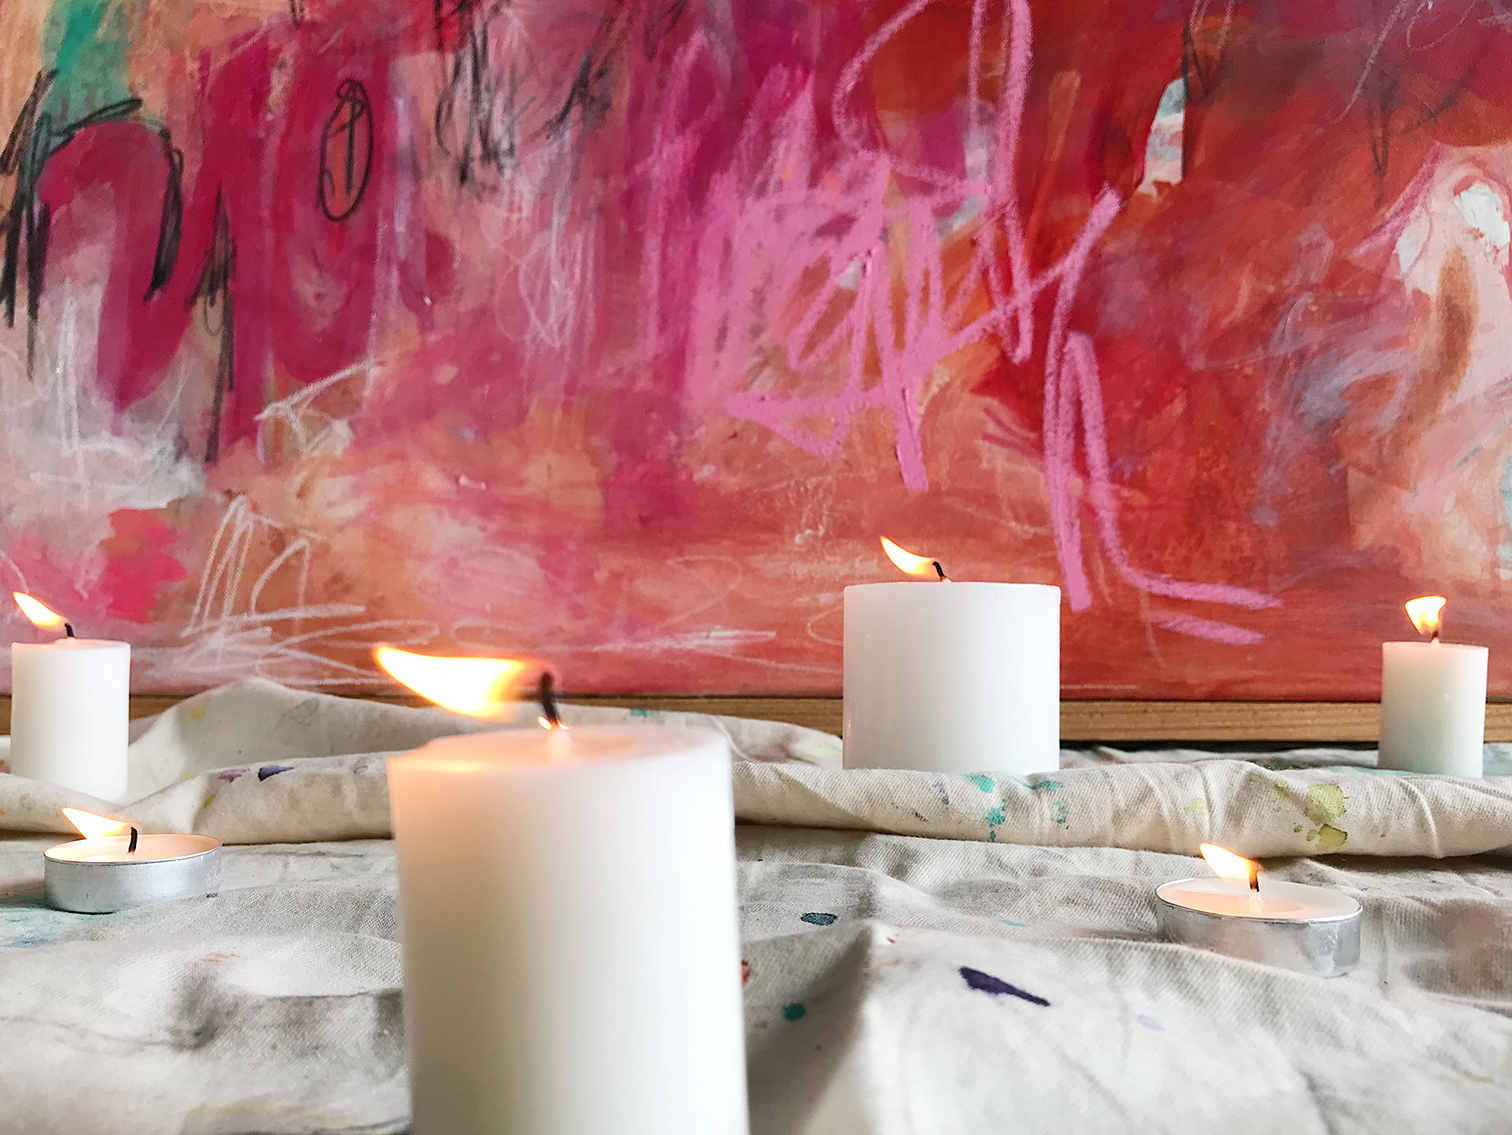 sheila-burgos-pink-moon-candles-closeup.jpg